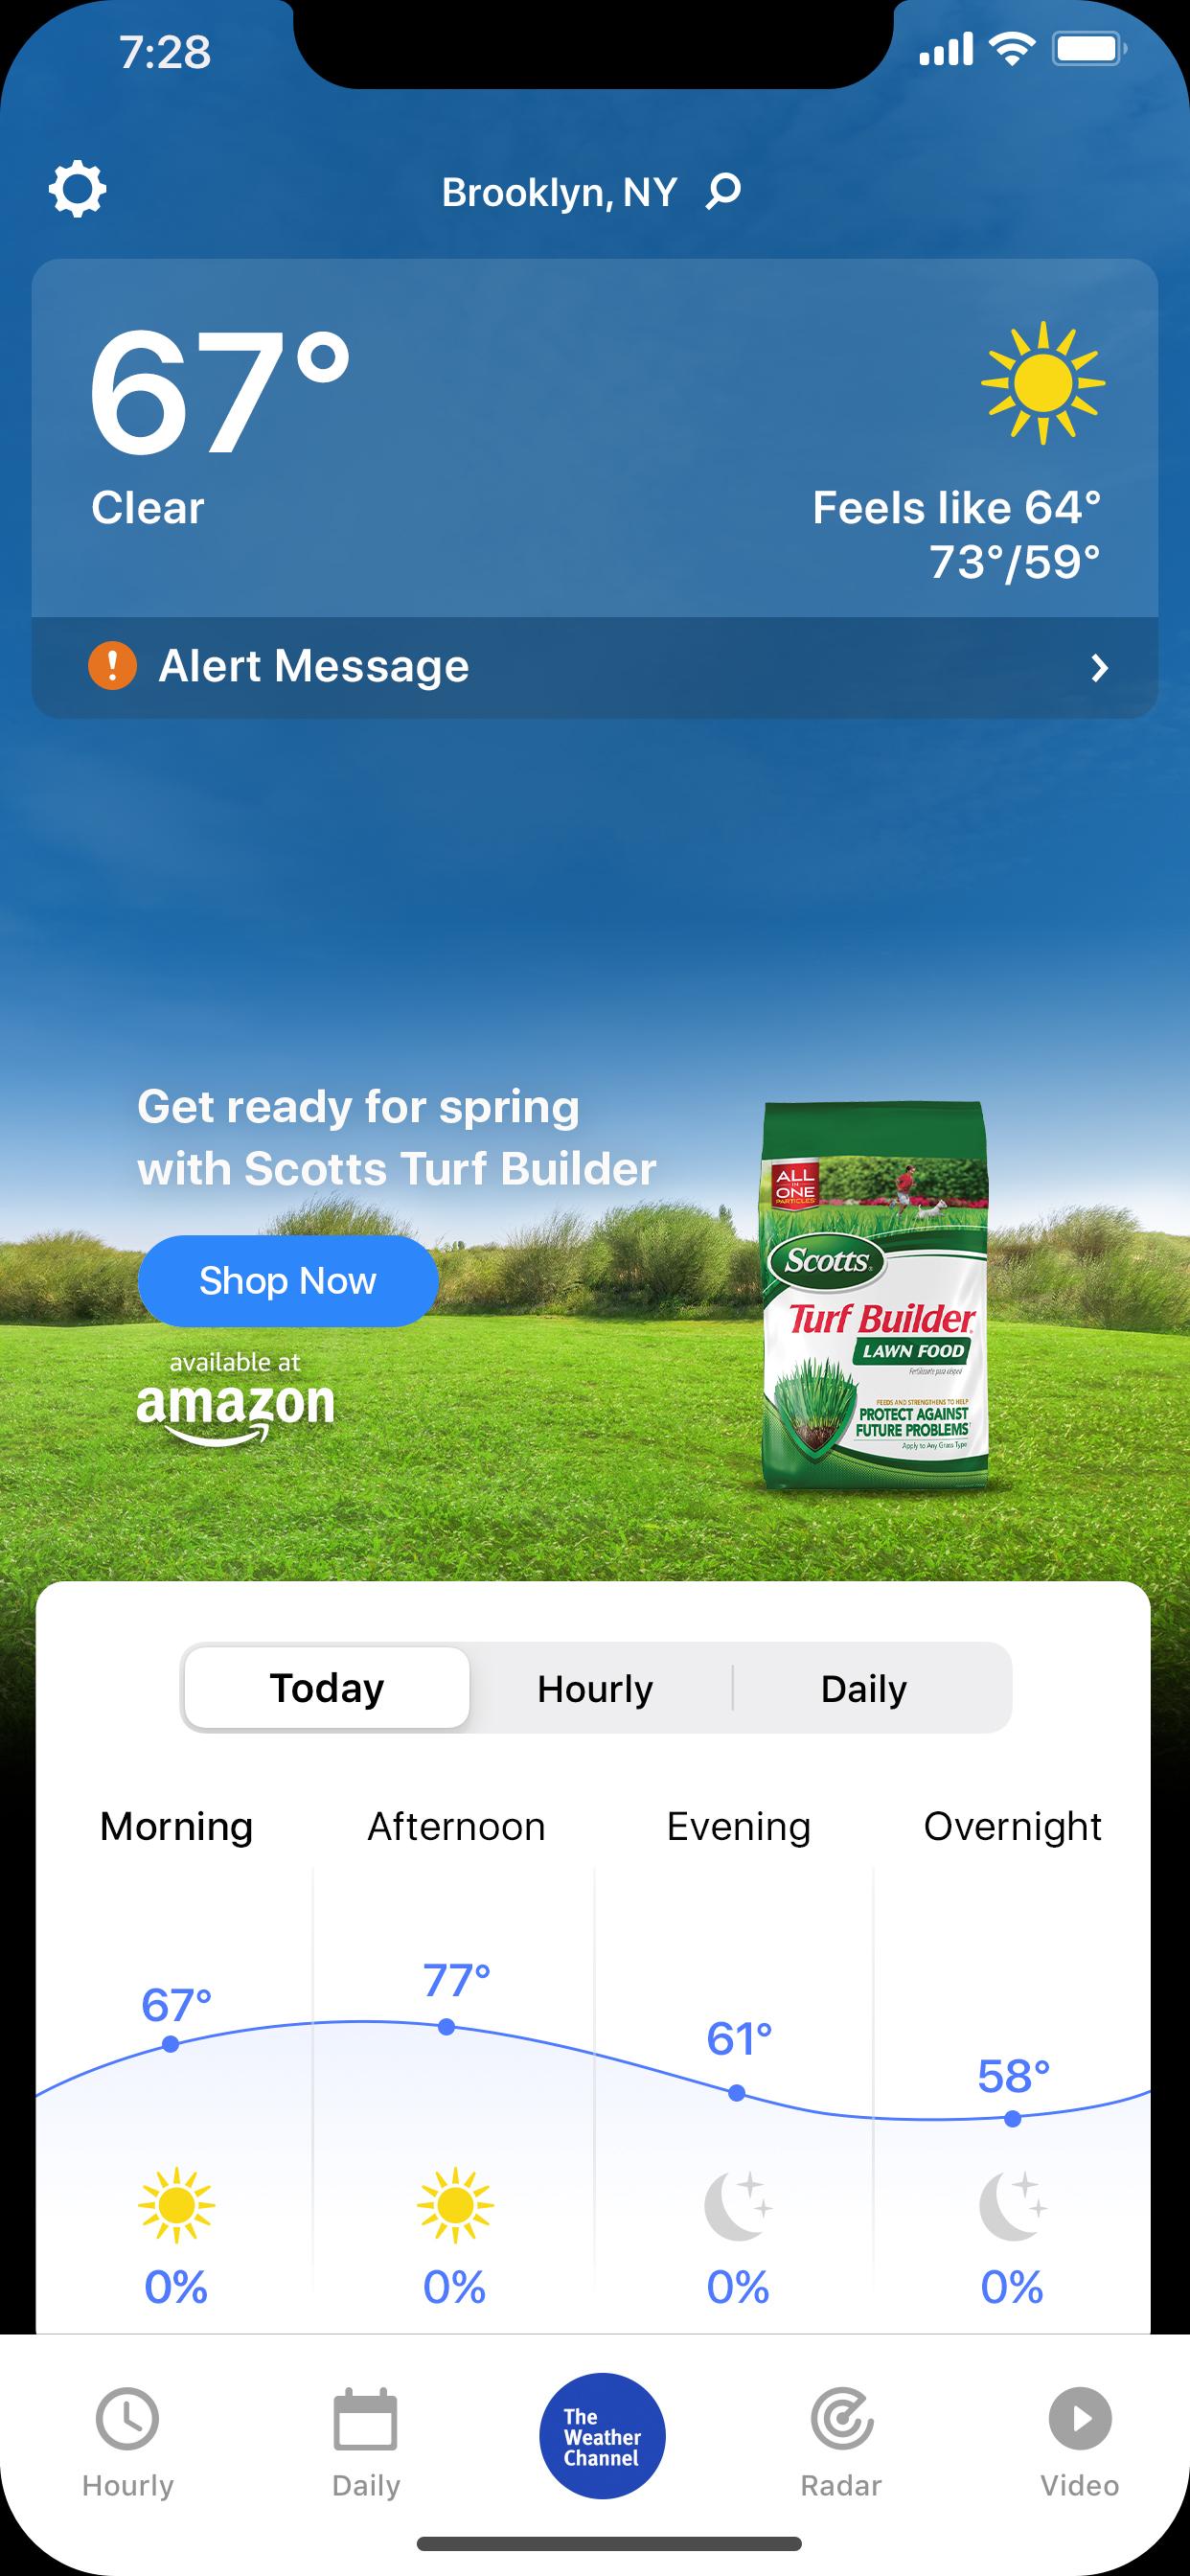 Amazon_SpringLawncare_Mobile_App-IM_NextGen-Mock